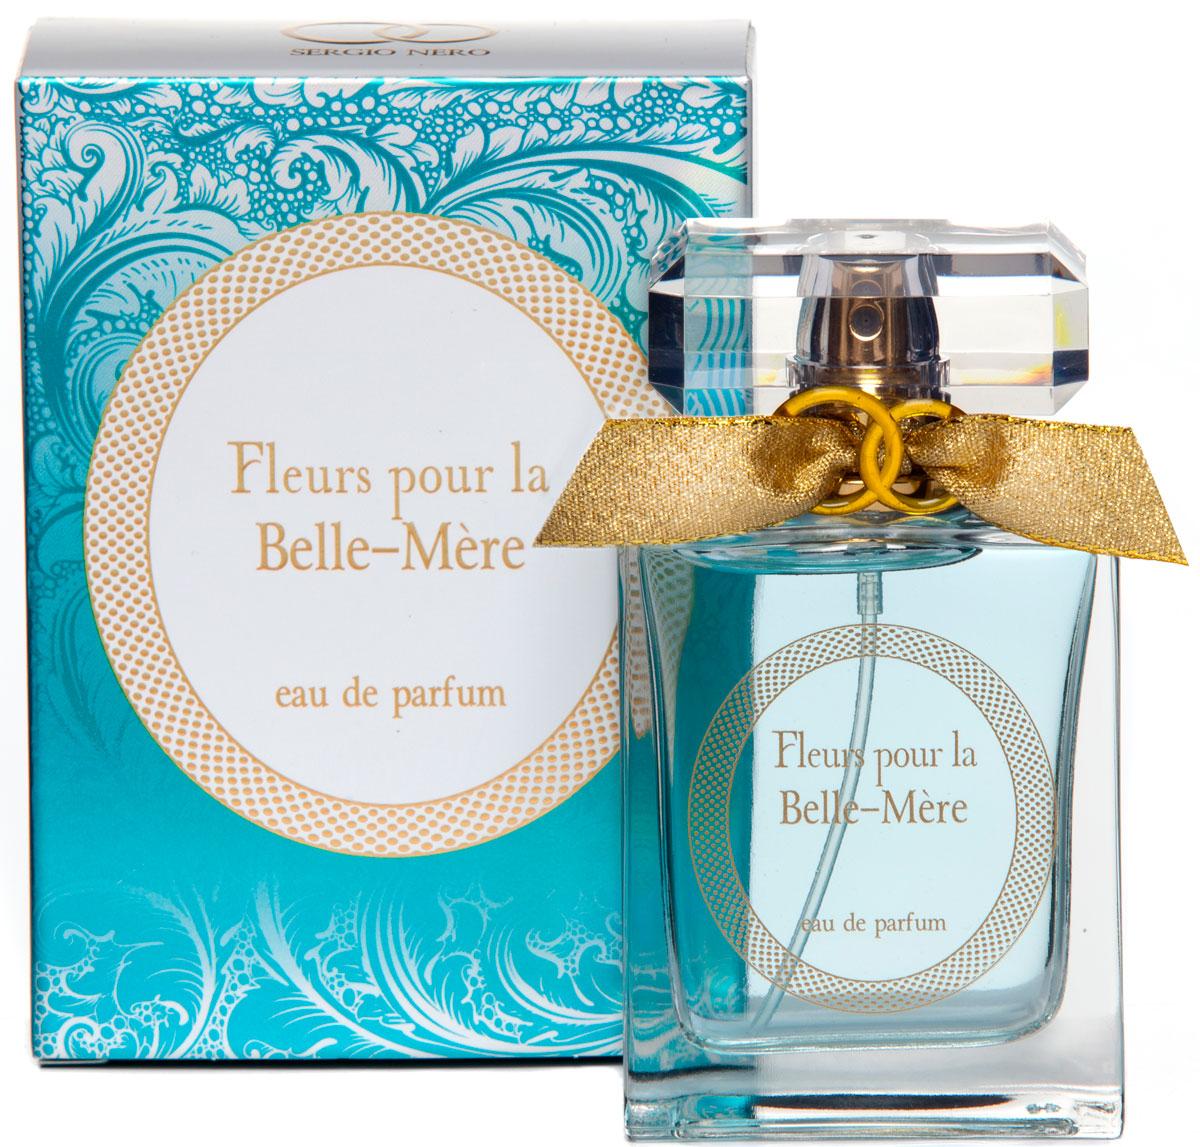 Sergio Nero Fleurs pour la Belle-Mere 50 мл sergio nero wedding fleurs pour la belle mere парфюмерная вода для женщин 50 мл